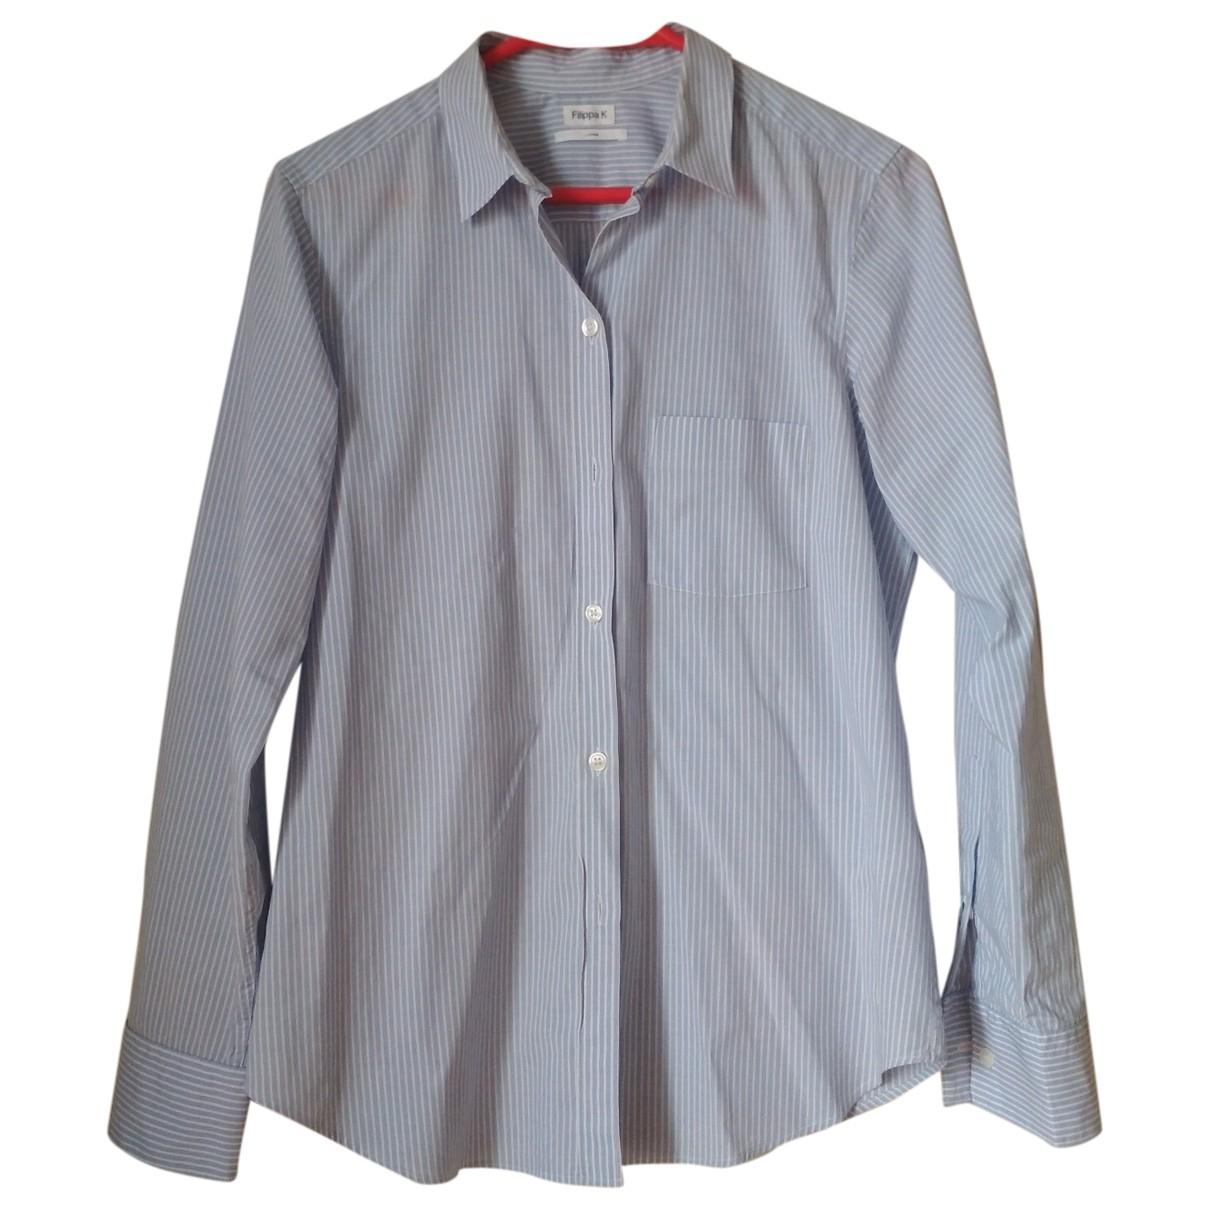 Filippa K \N Multicolour Cotton  top for Women 38 FR